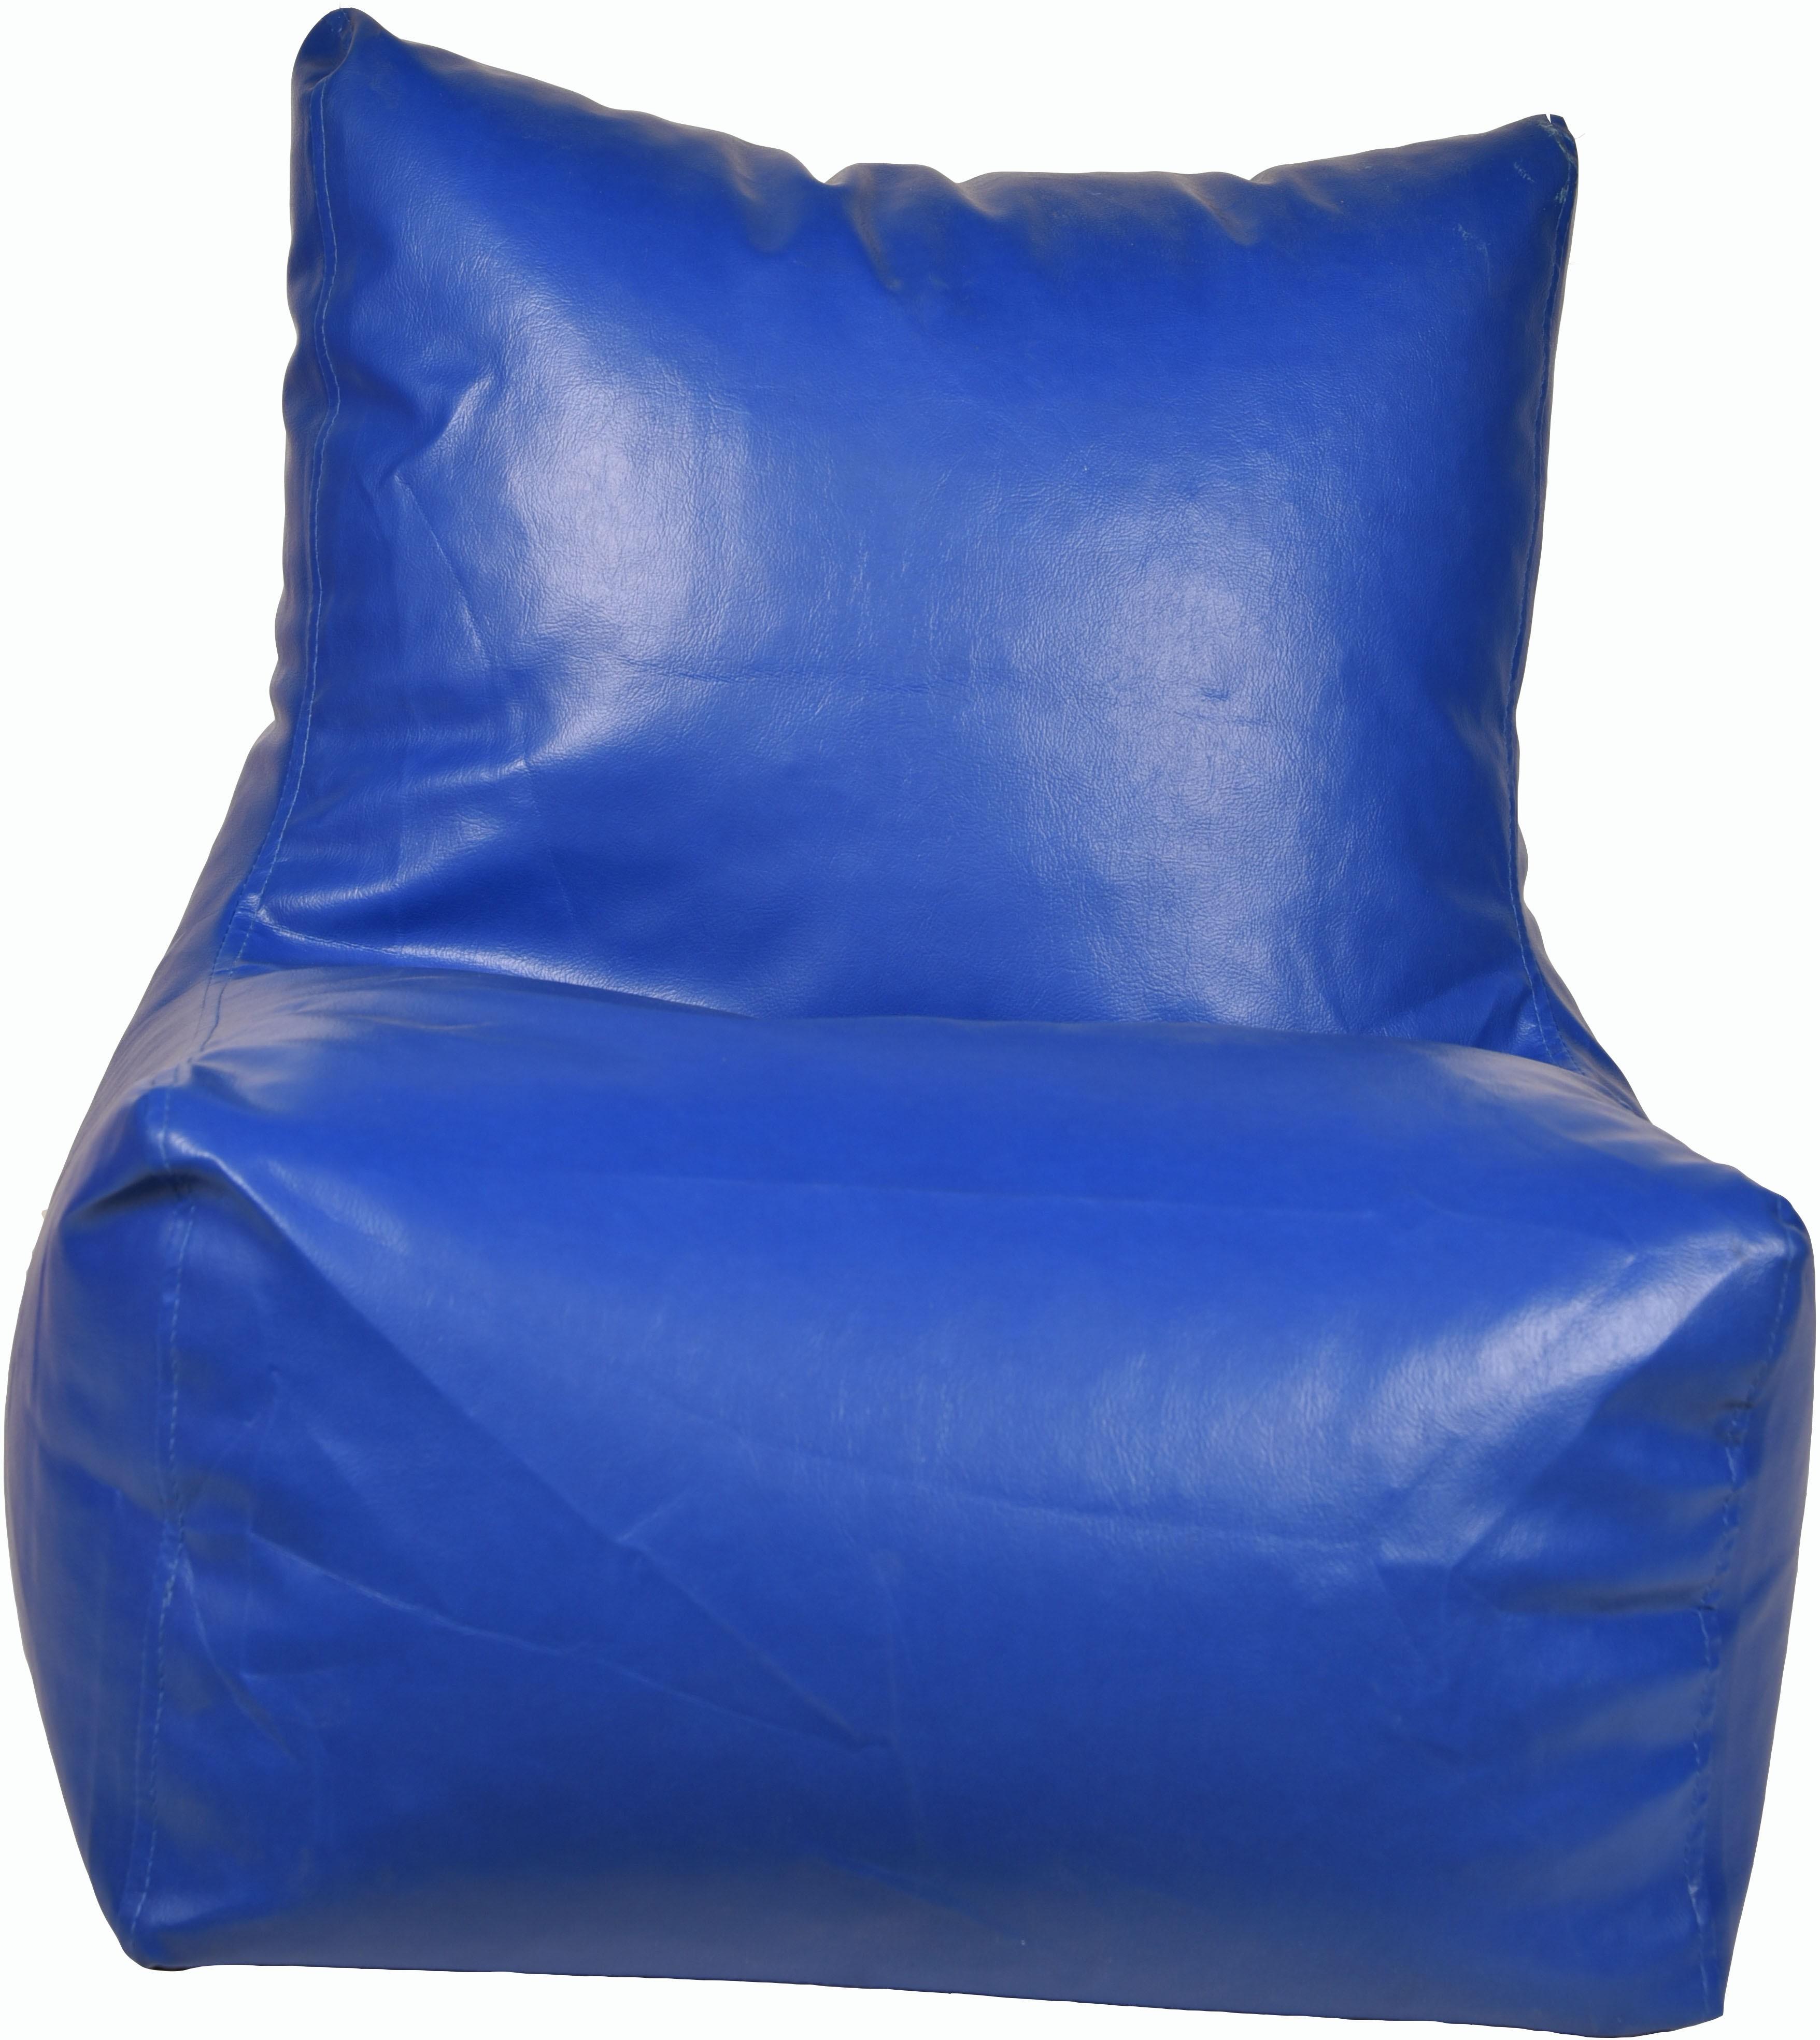 View Mobler XXXL Bean Bag  With Bean Filling(Blue) Furniture (Mobler)